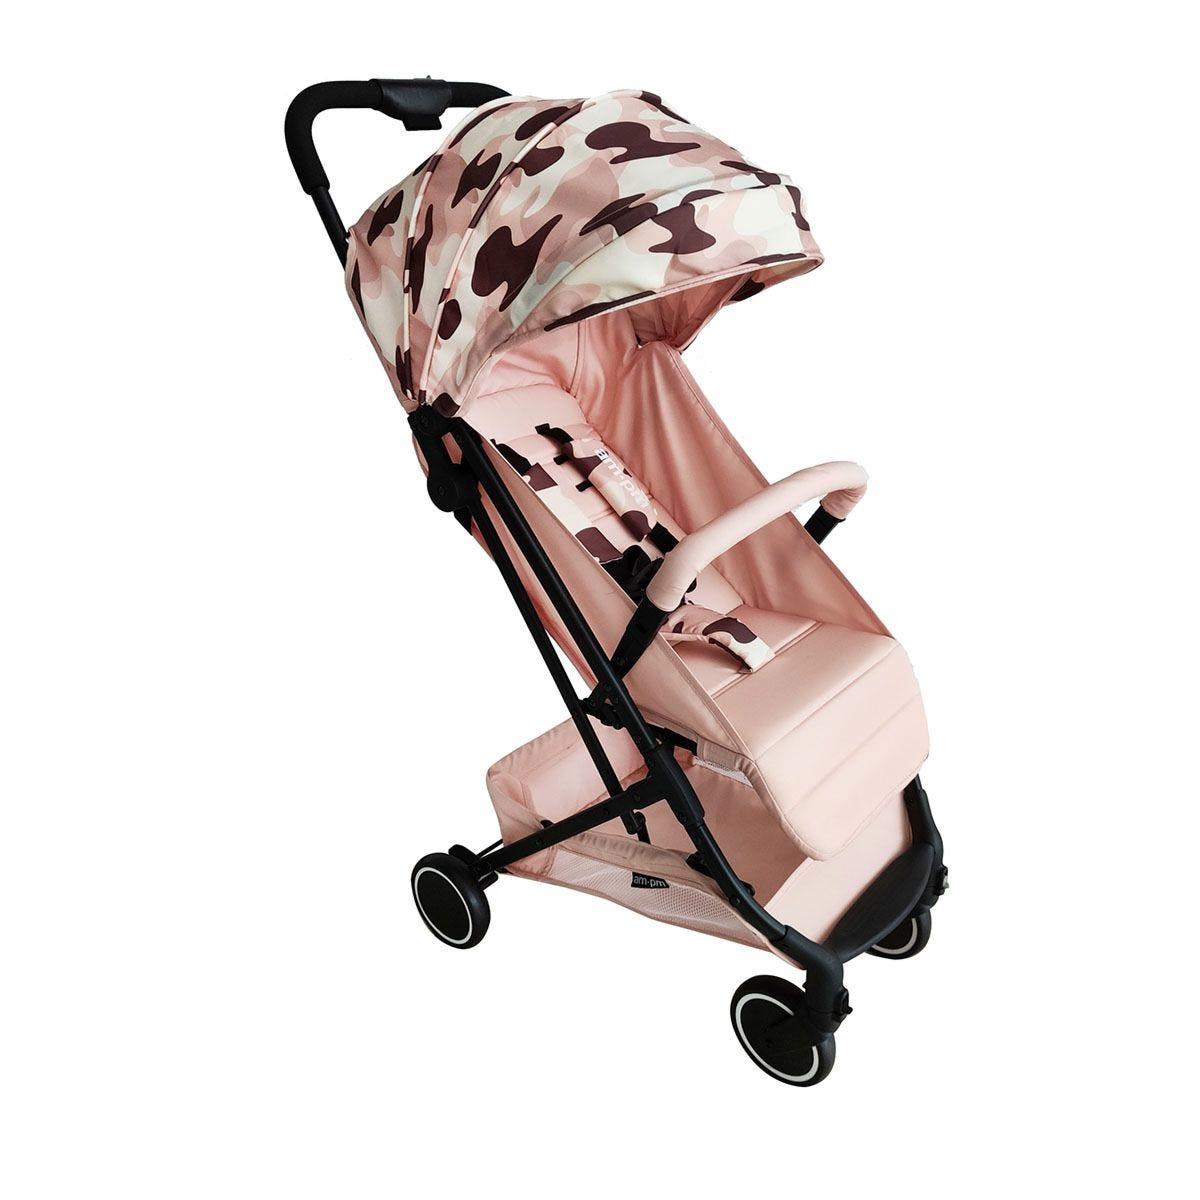 My Babiie AM to PM Christina Milian MBX1 Compact Stroller - Blush Camo